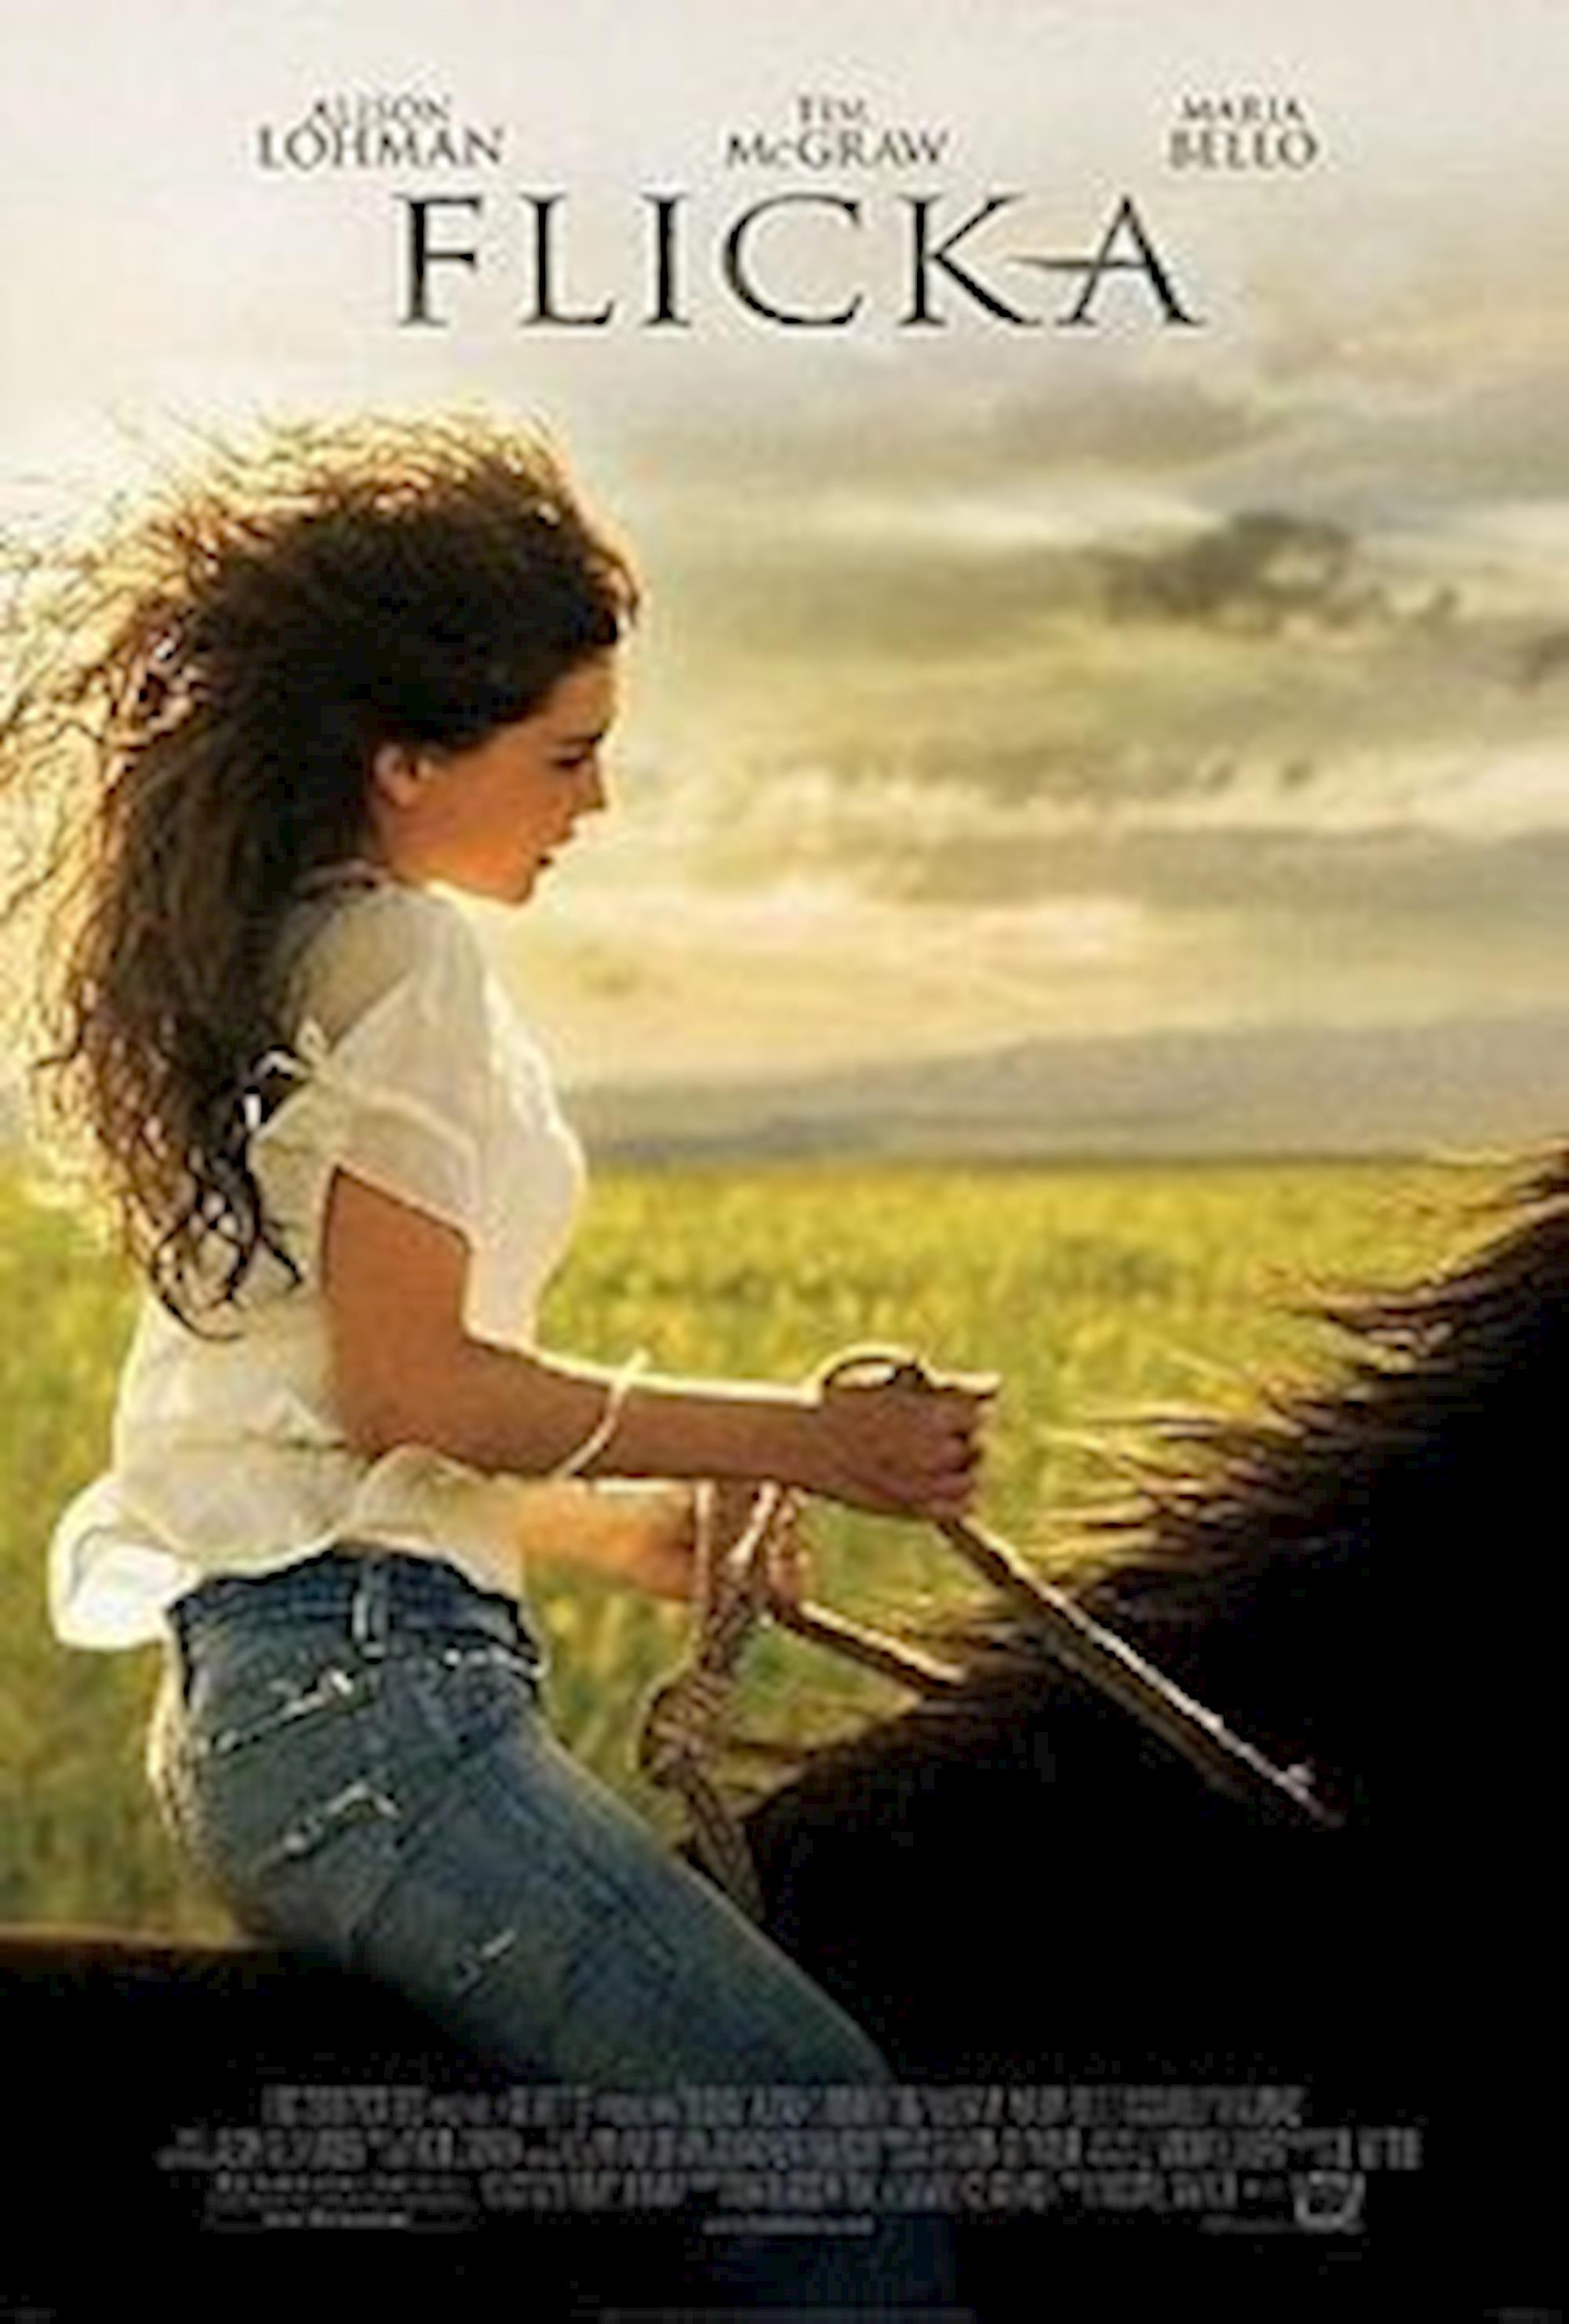 filmes de cavalos, dicas de filmes, Flicka,